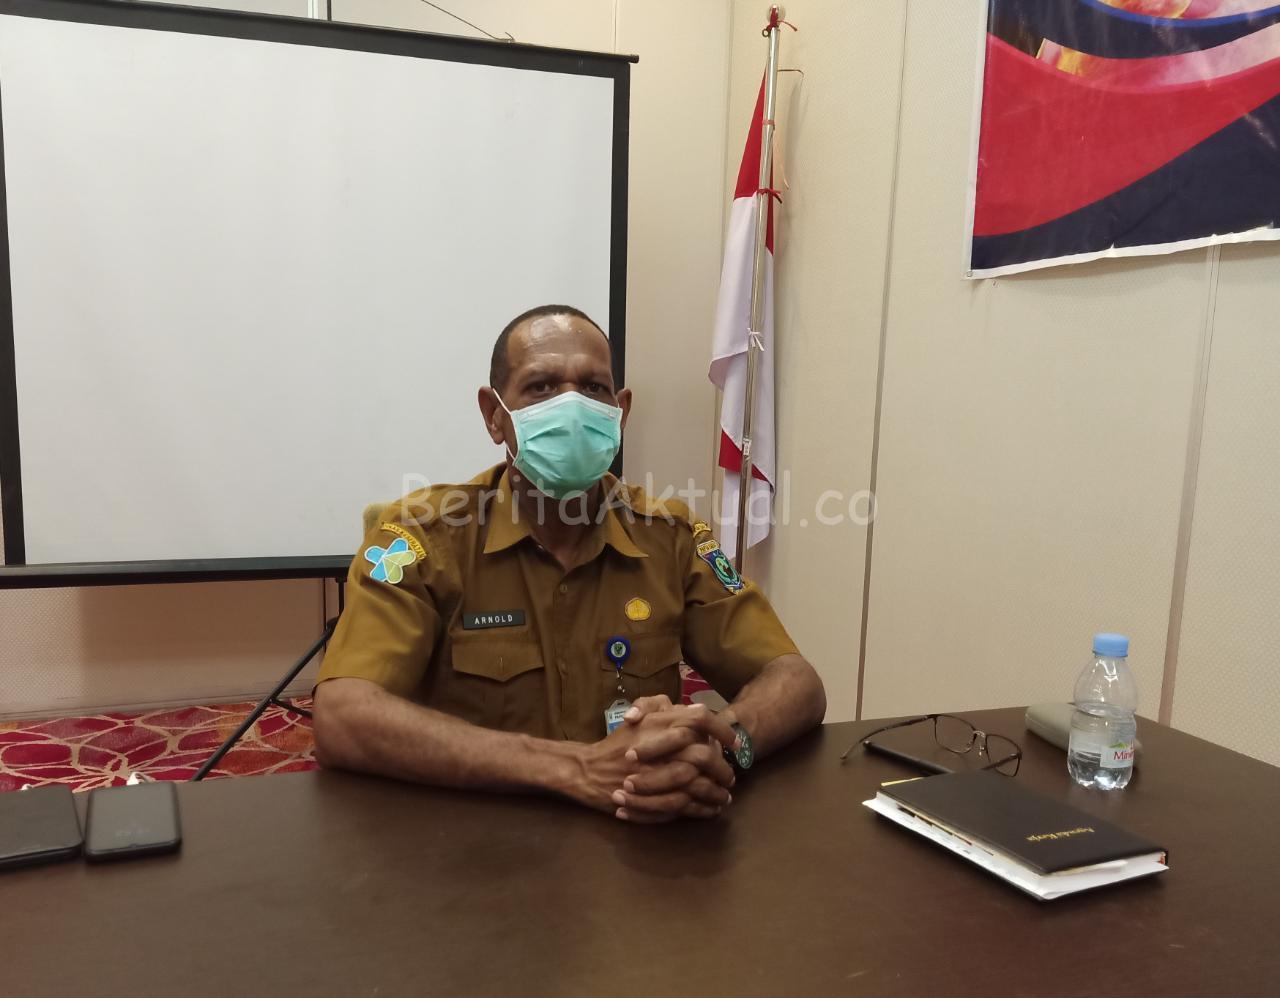 Sampai Hari ini Senin 4 Mei, Papua Barat Tidak Ada Penambahan Pasien Positif 1 IMG 20200504 WA0045